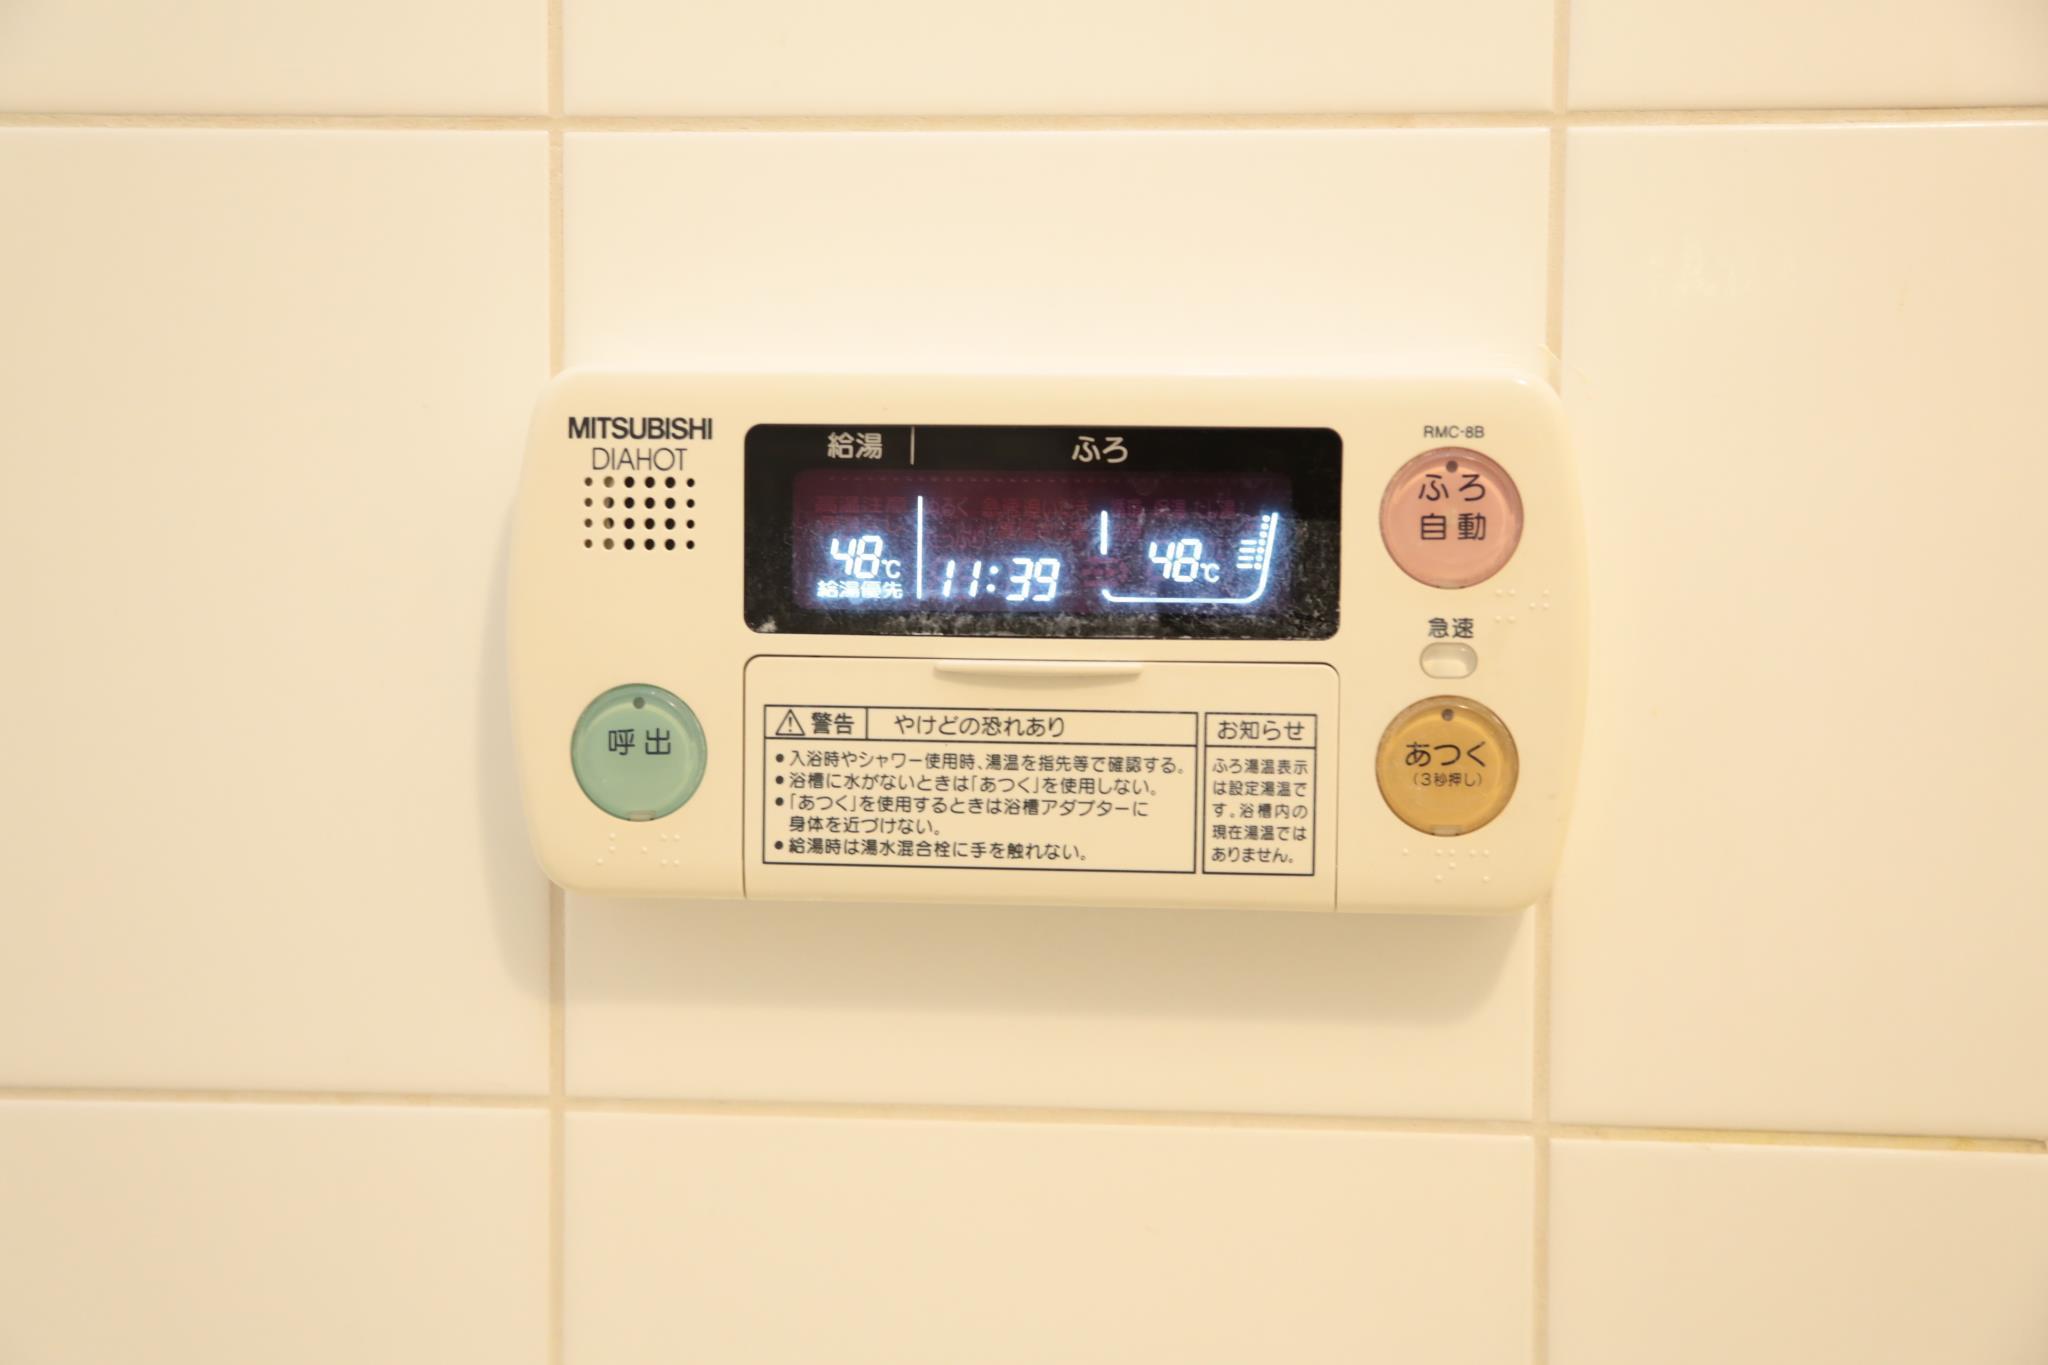 20 3min Subway Shinsaibashi Sta 4people Private Osaka